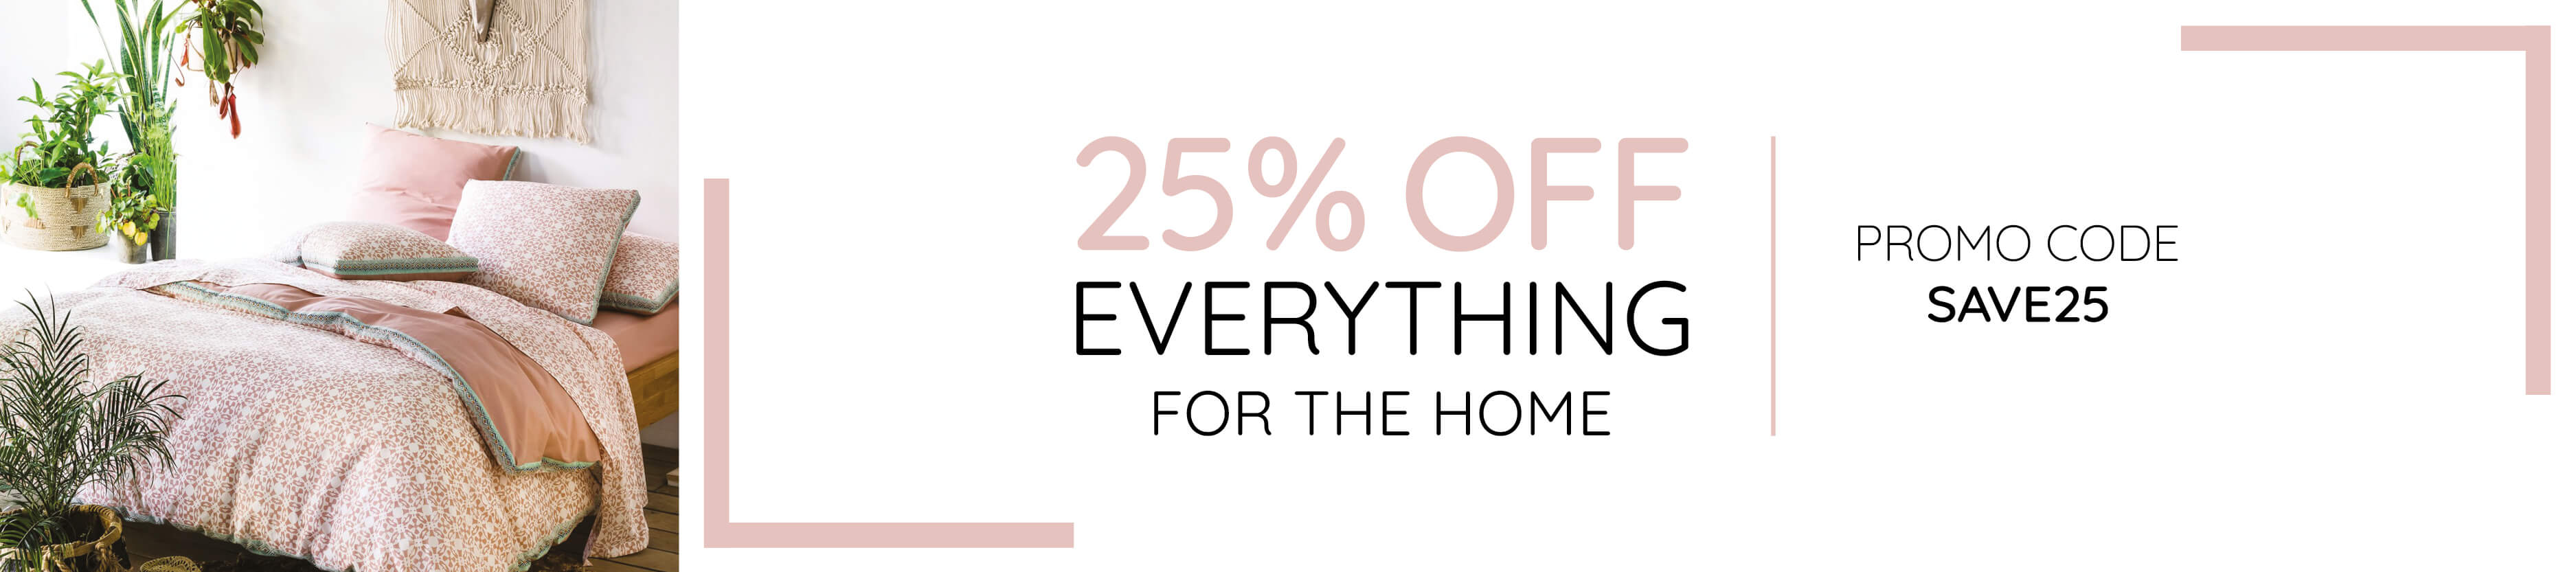 25% OFF Homeware